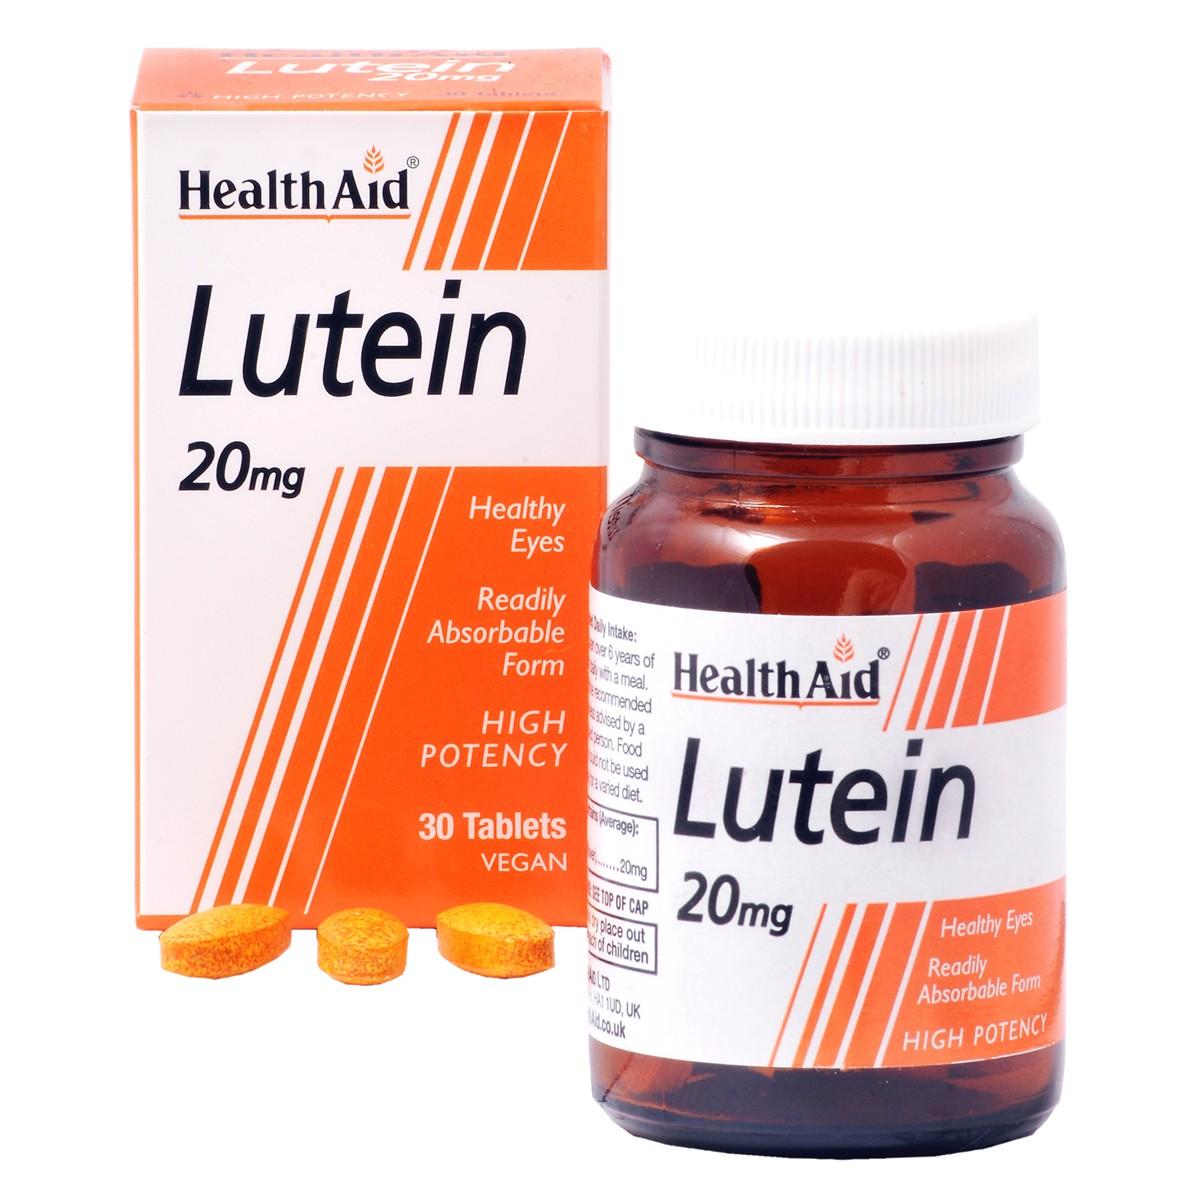 HealthAid Lutein 20mg